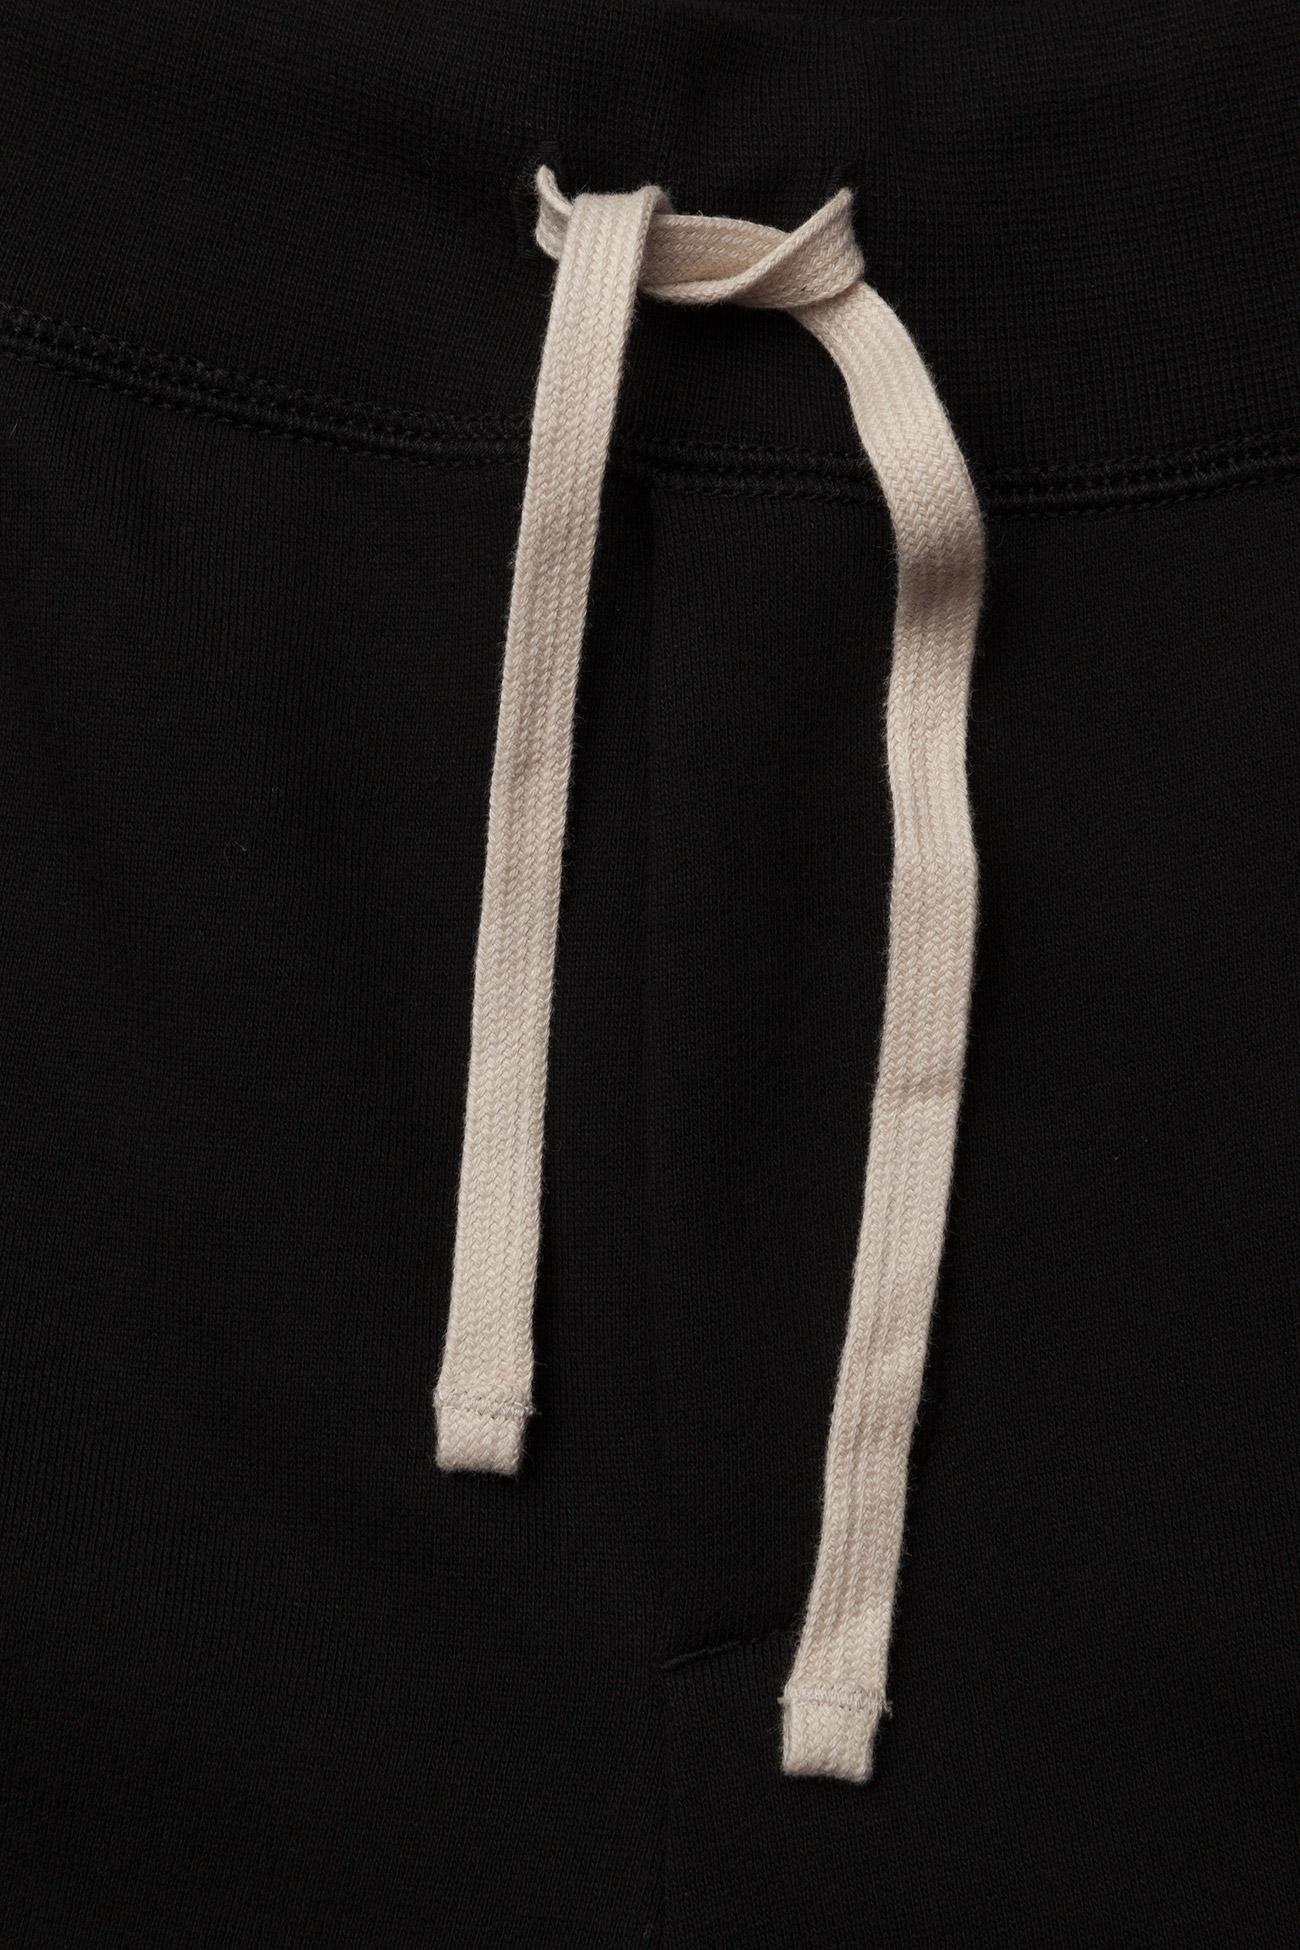 blend Joggerpolo fleece Lauren Ralph Cotton BlackPolo 0v8ymNnwO